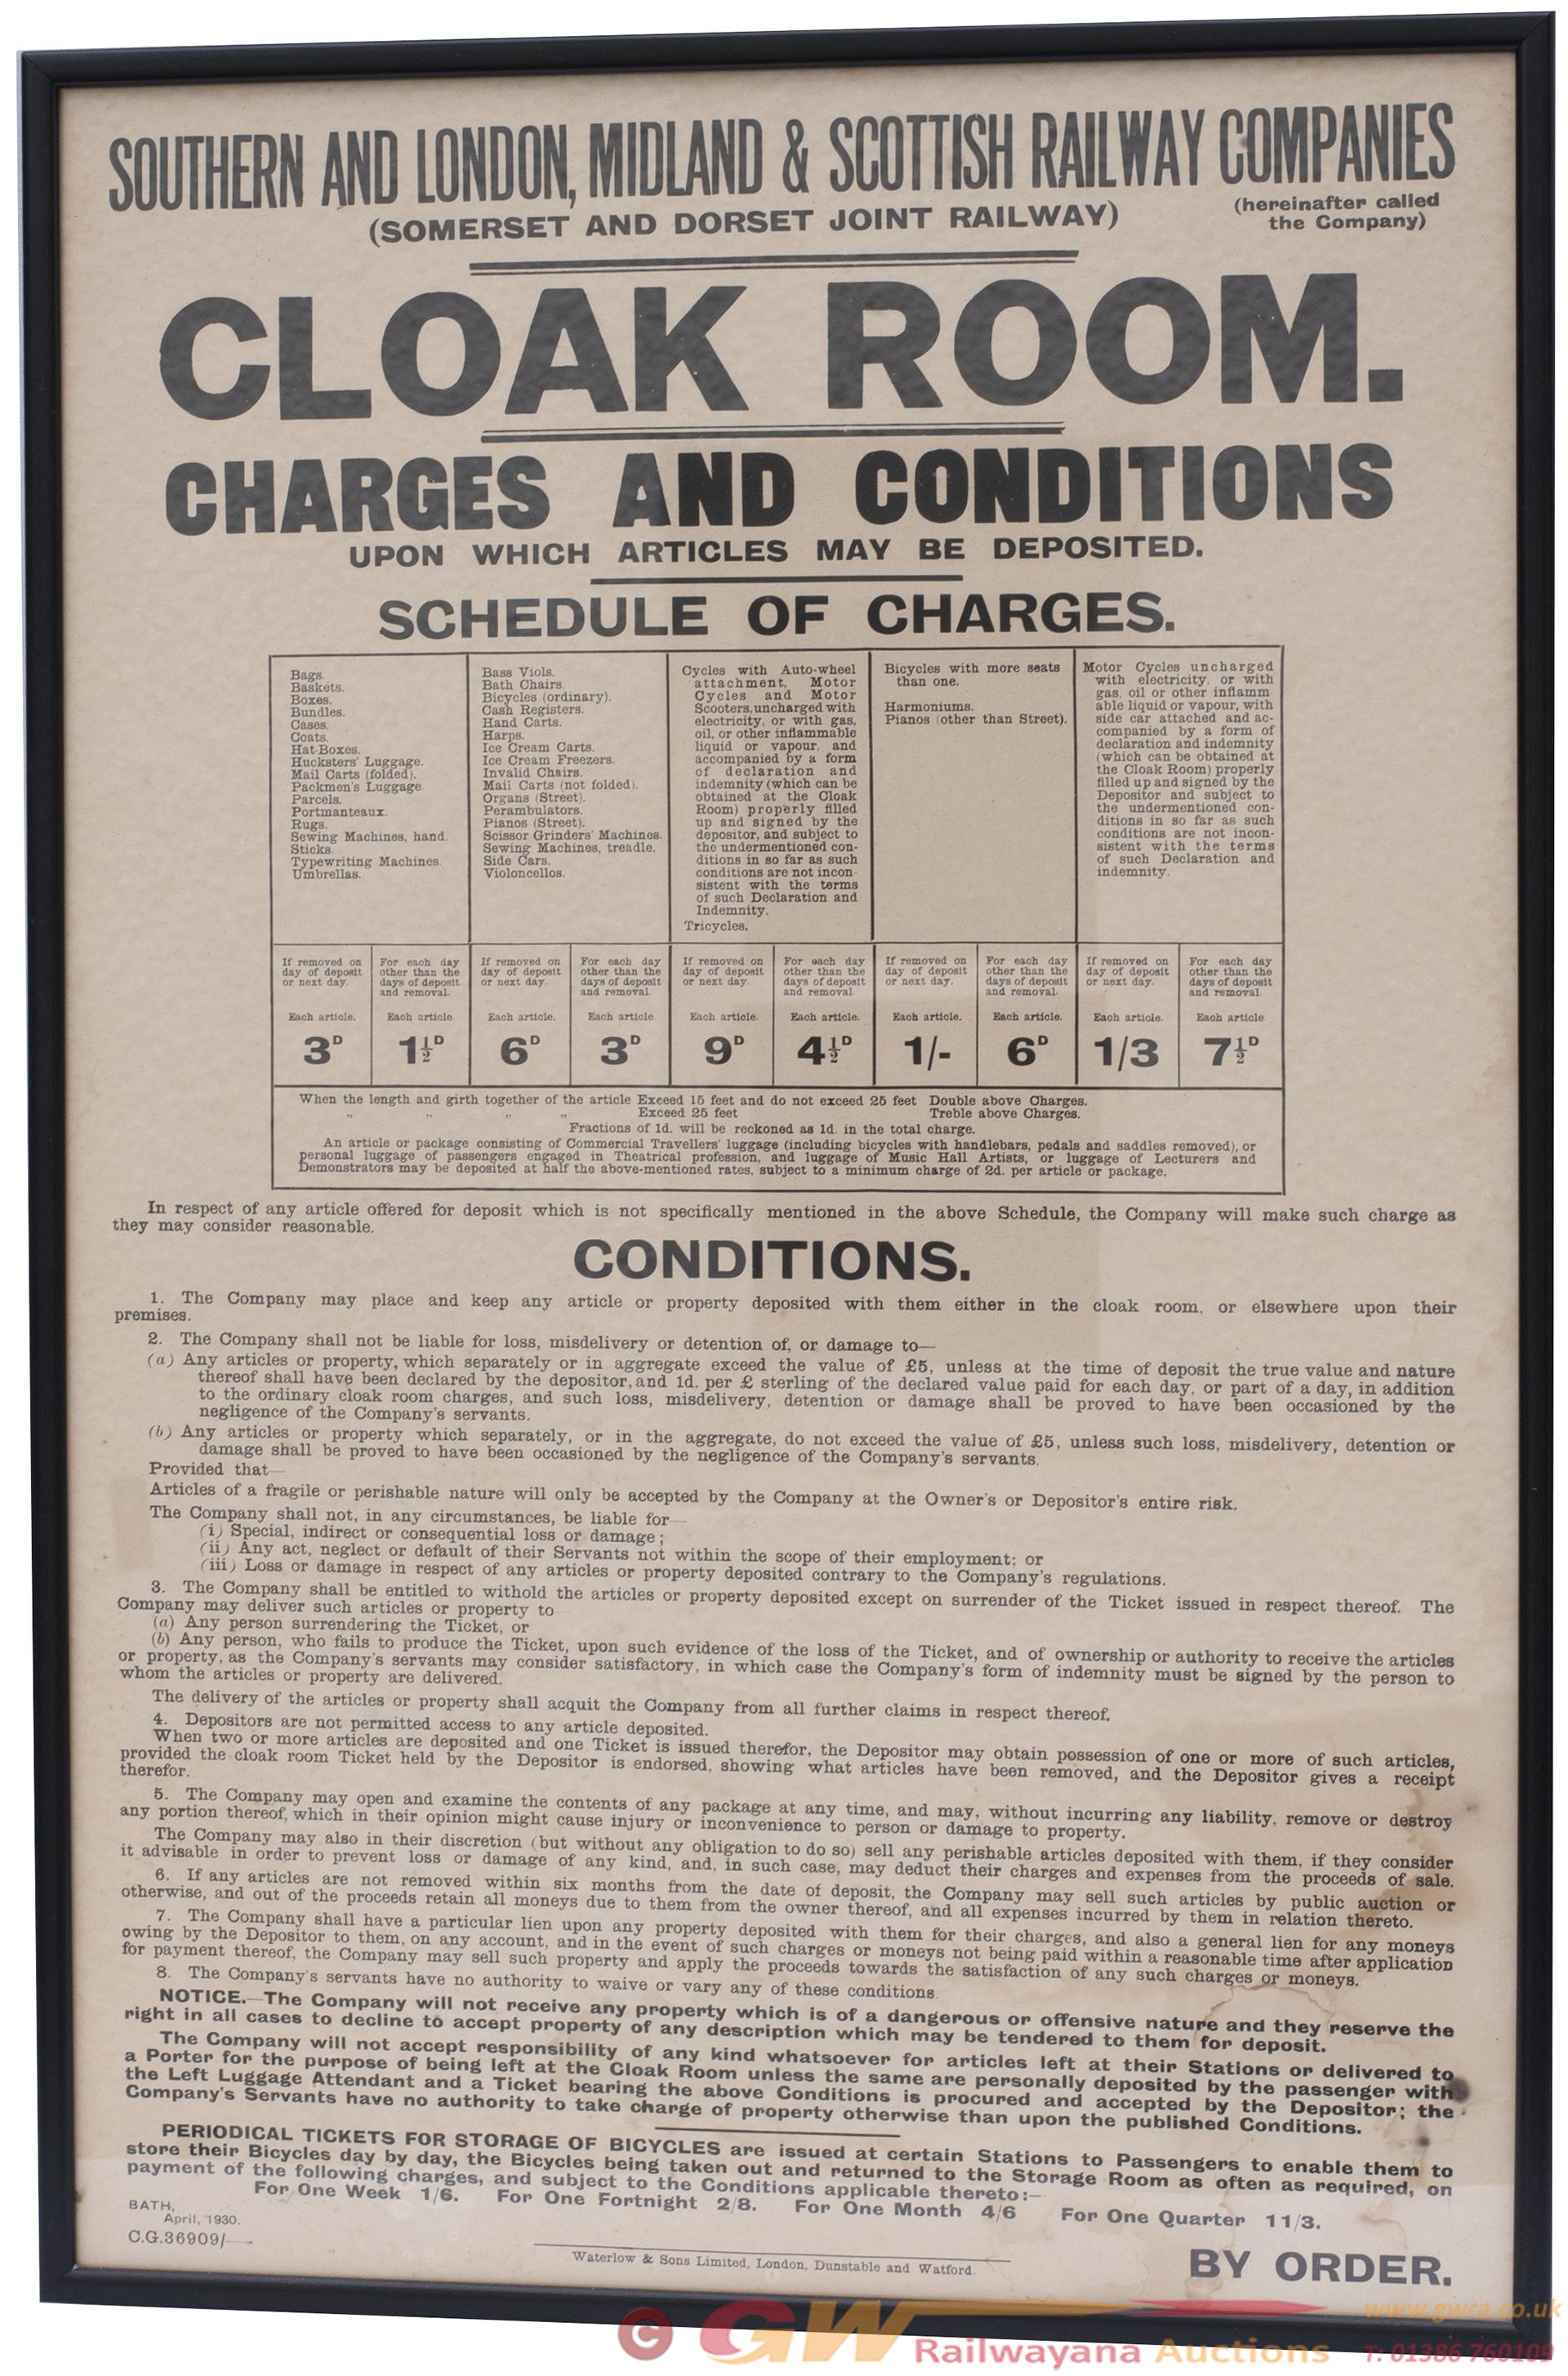 Poster SOMERSET AND DORSET JOINT RAILWAY CLOAK